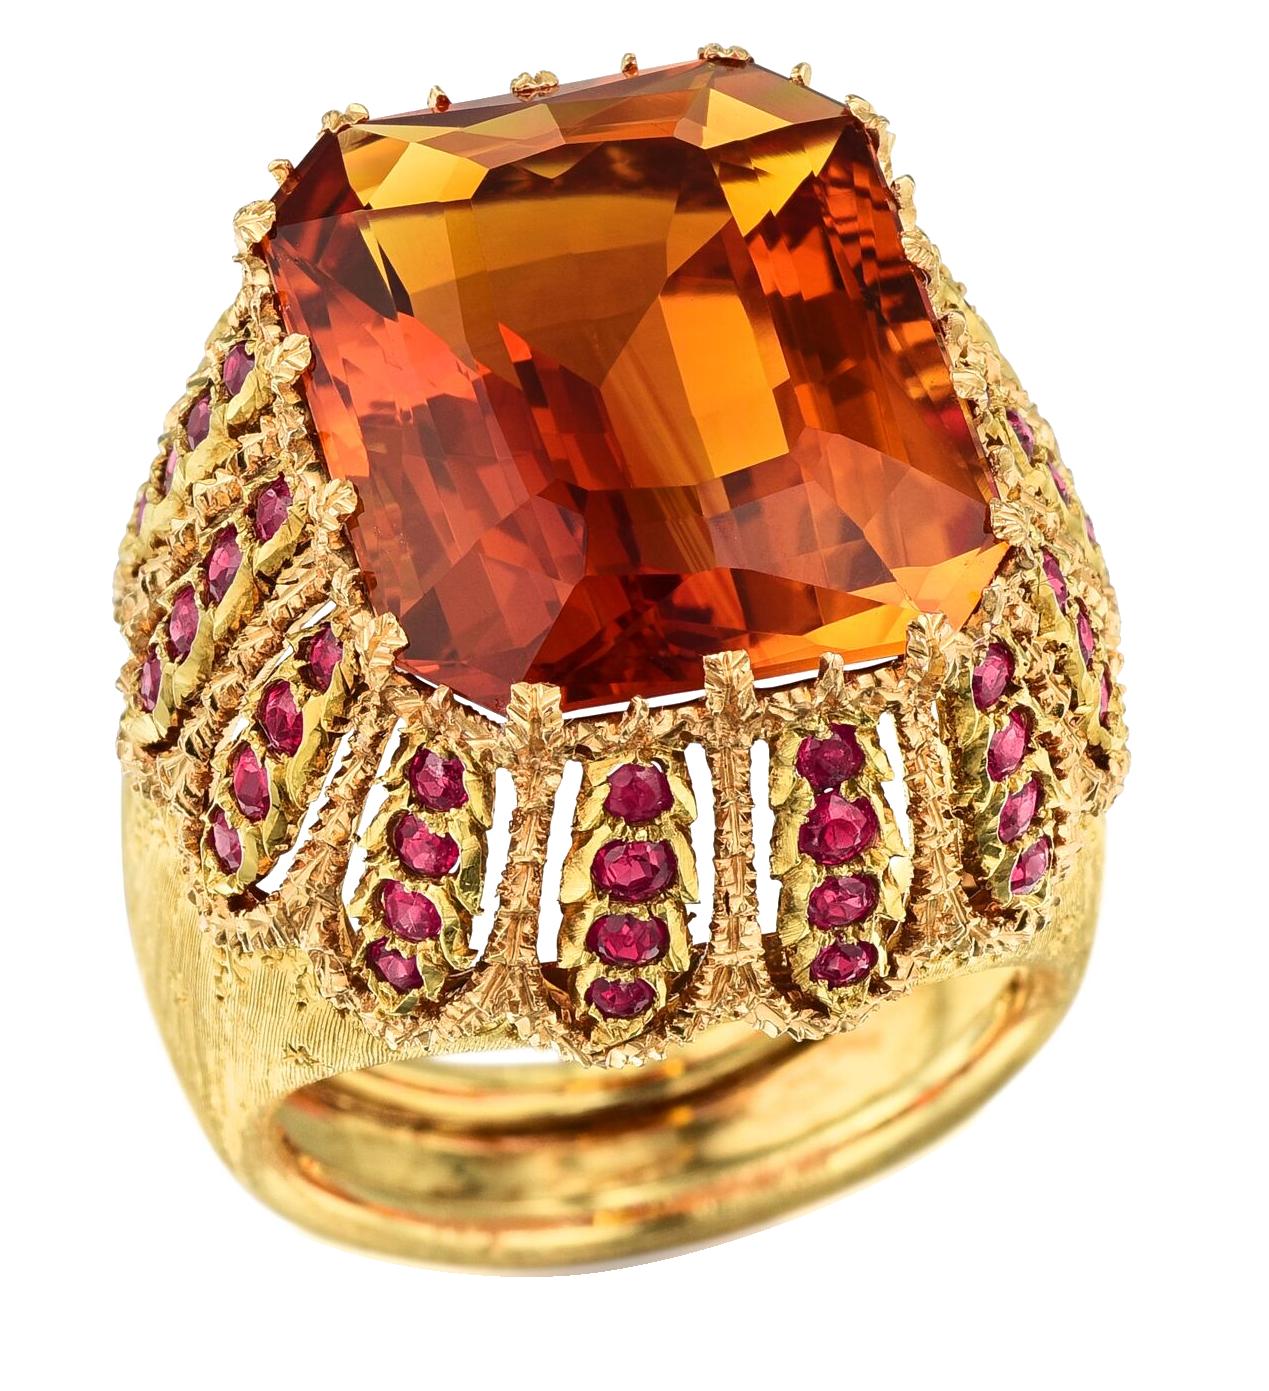 citrine-and-ruby-ring-buccellati-de56